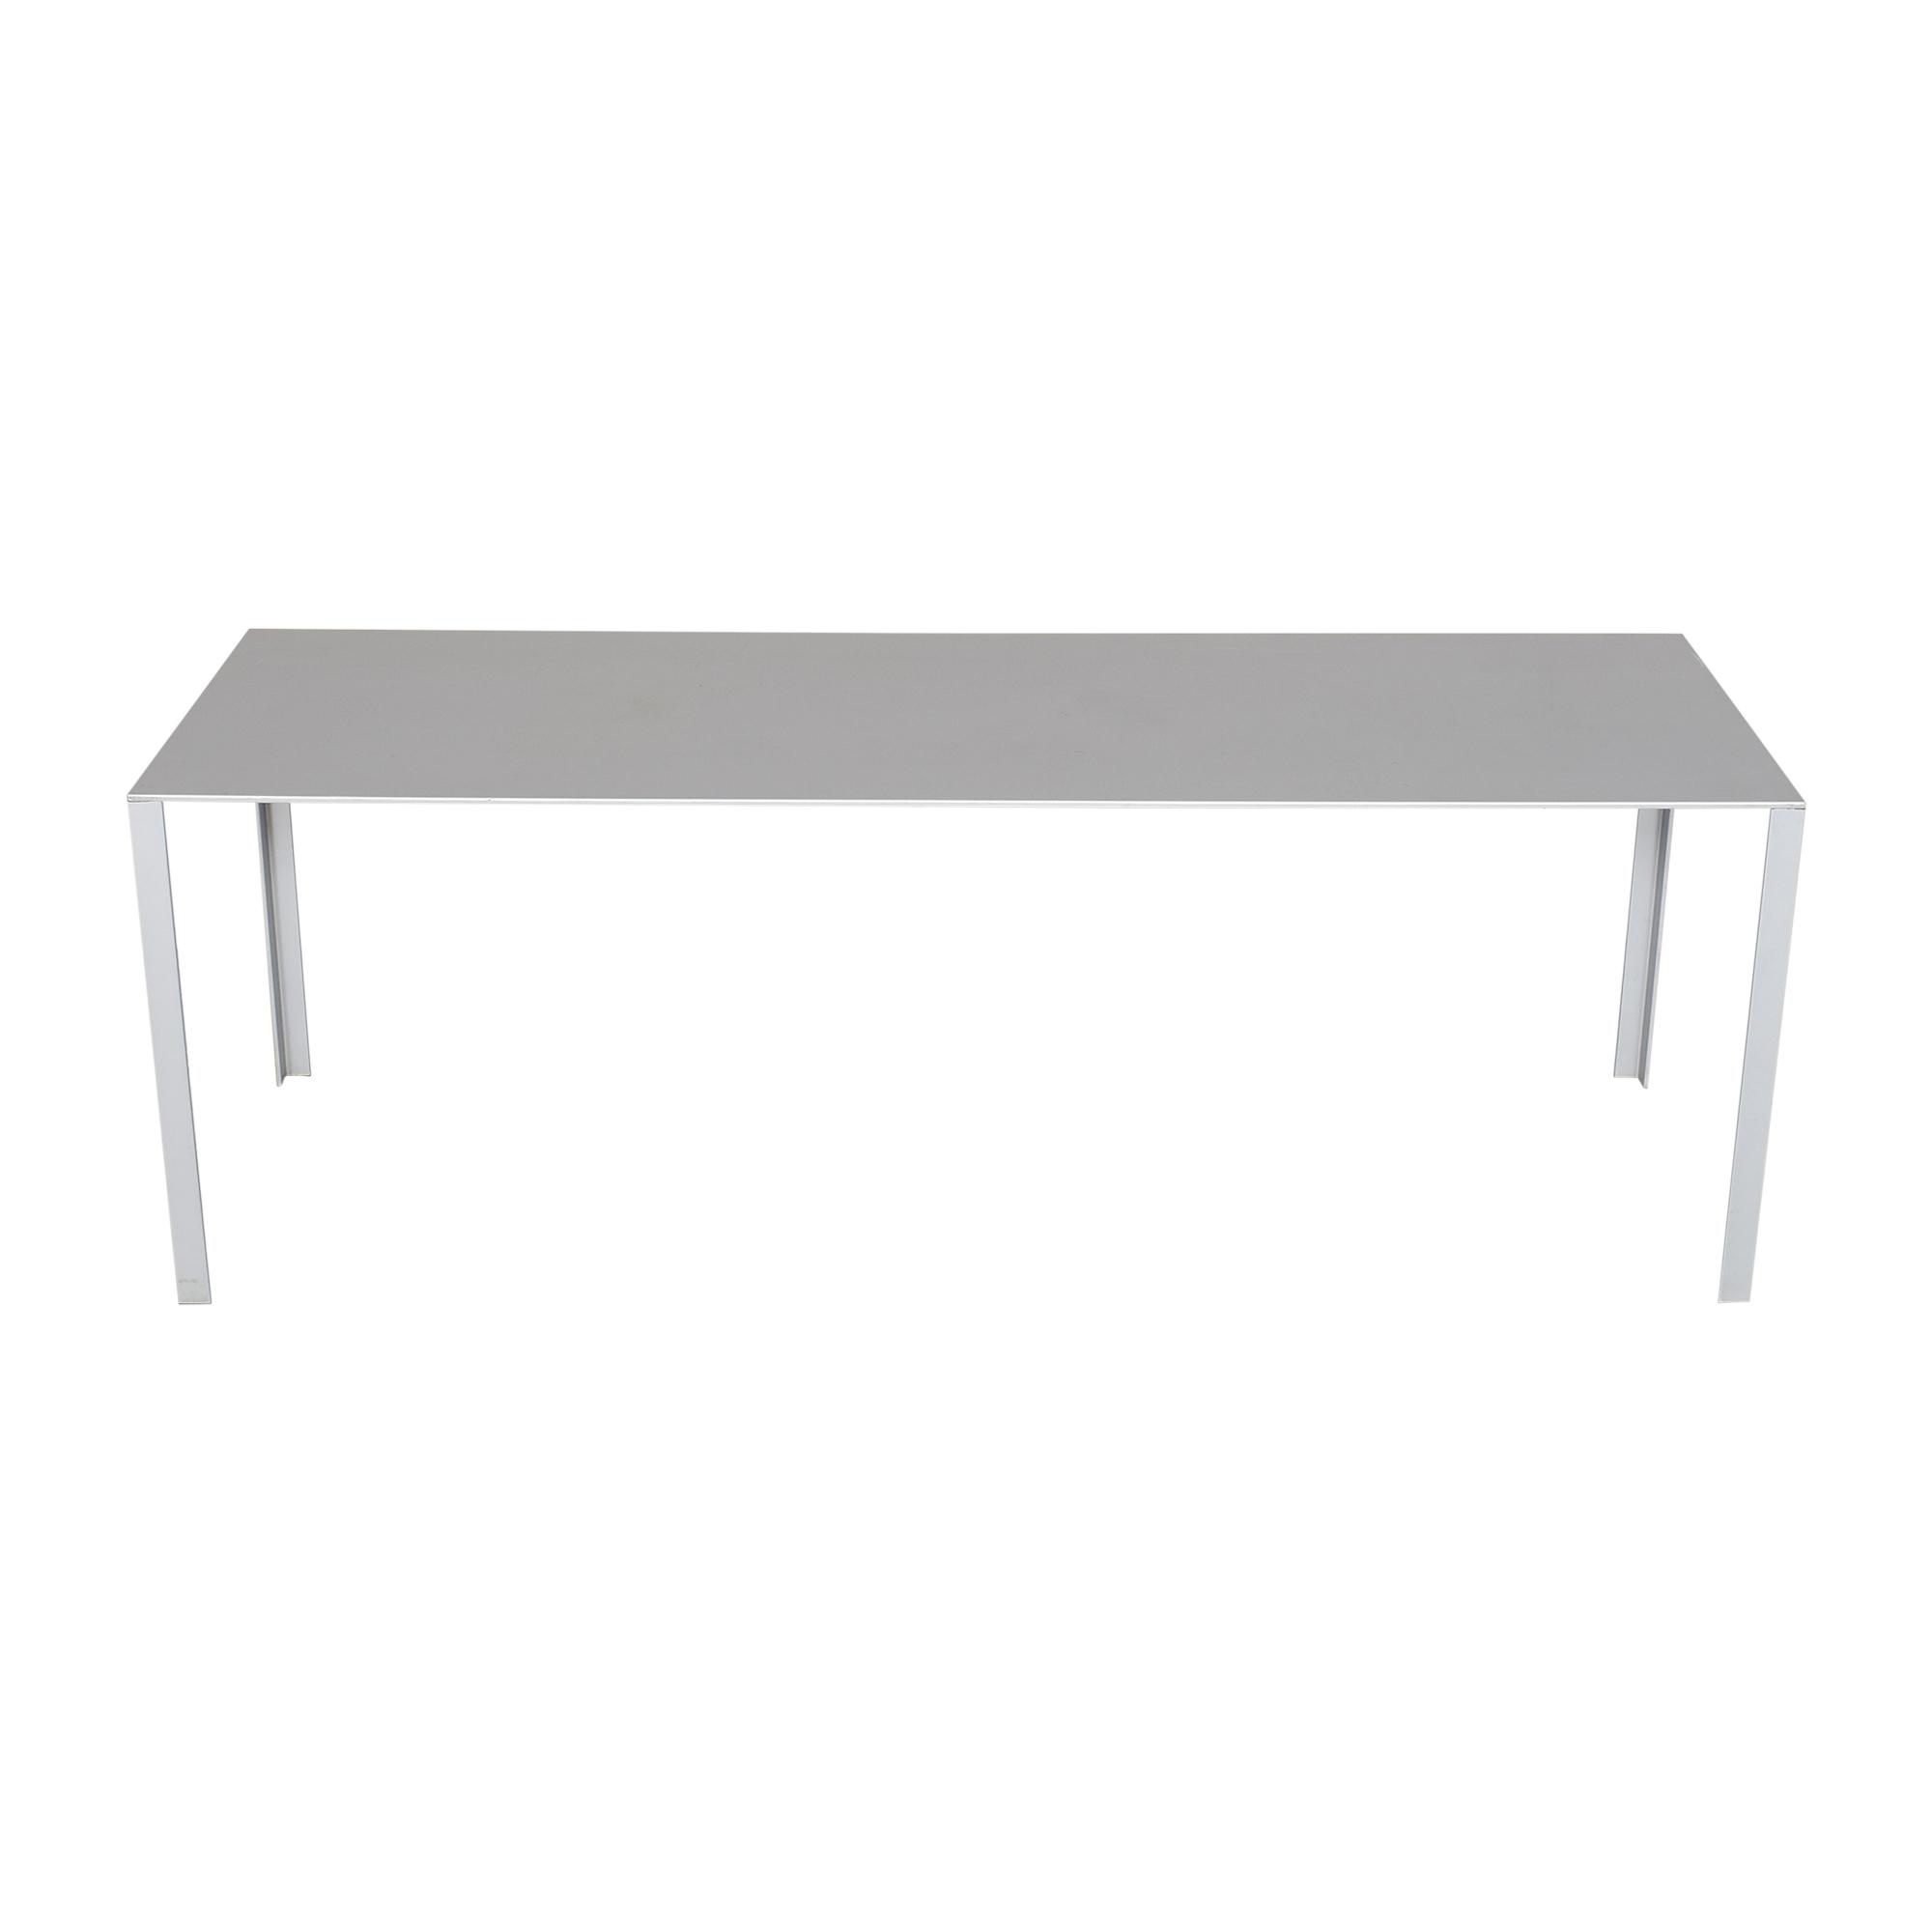 Molteni Molteni Less Table by Jean Nouvel on sale